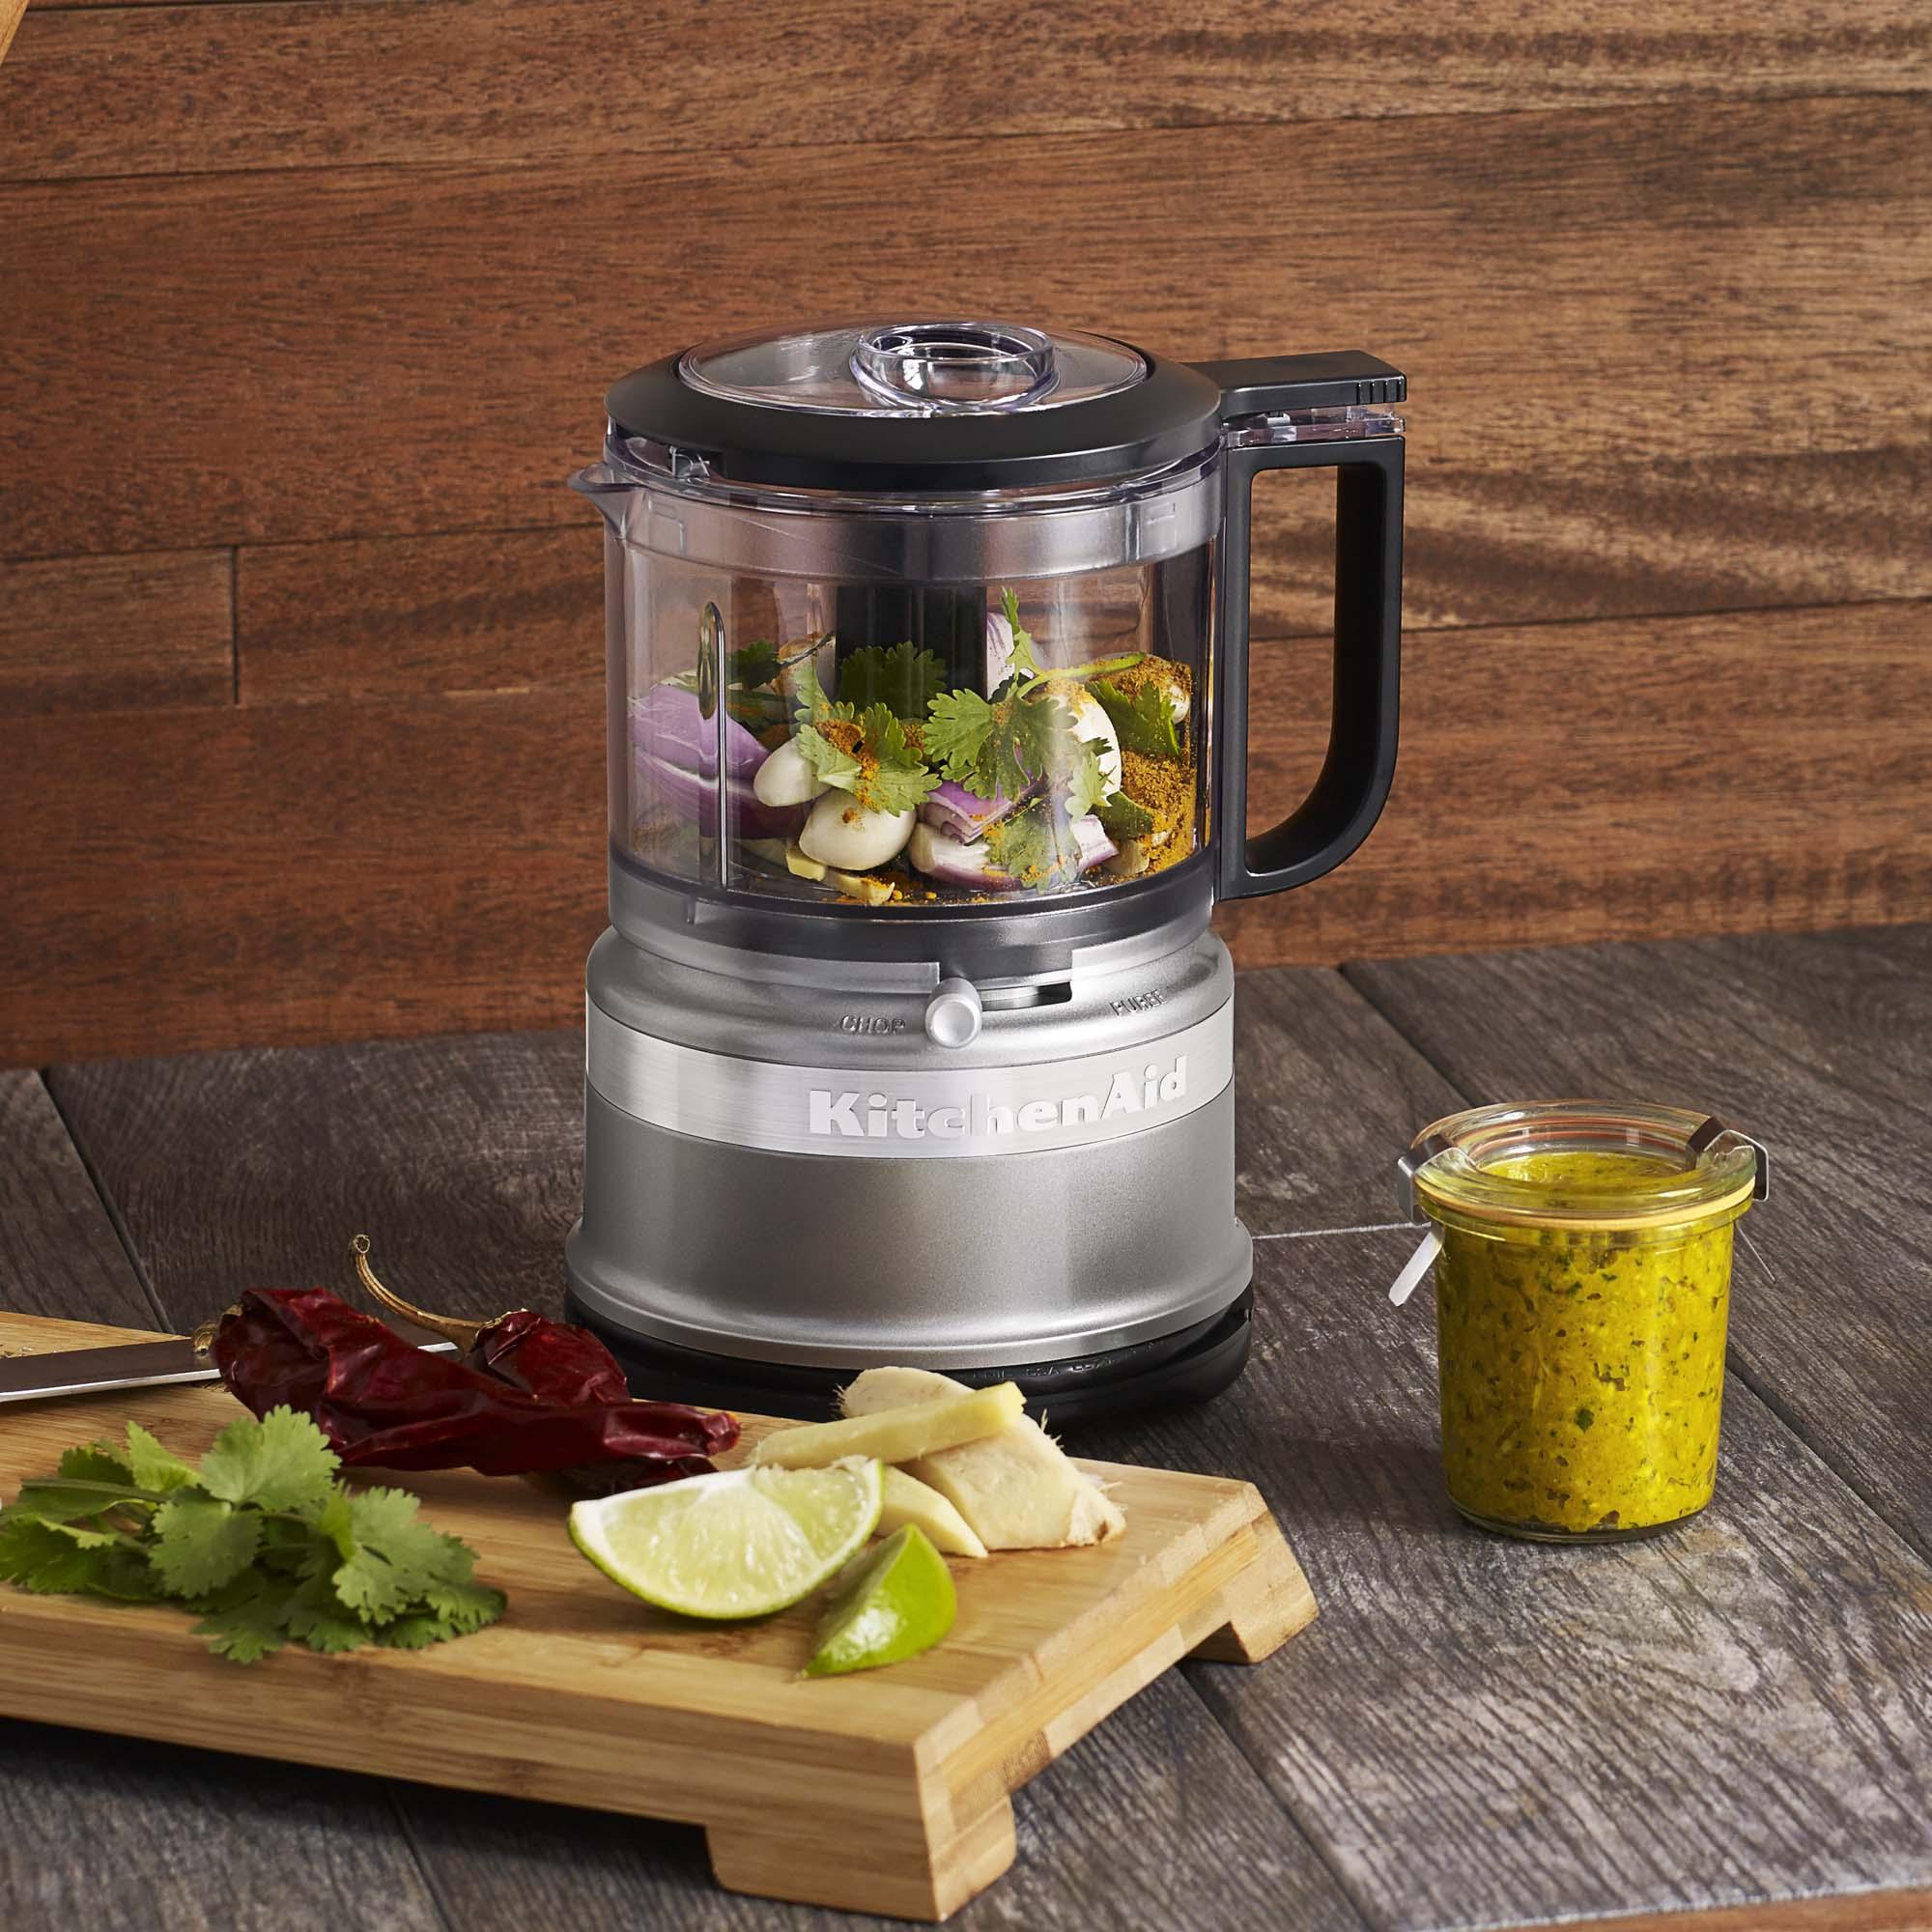 KitchenAid-Refurbished-3-5-Cup-Food-Chopper-RKFC3516 thumbnail 9